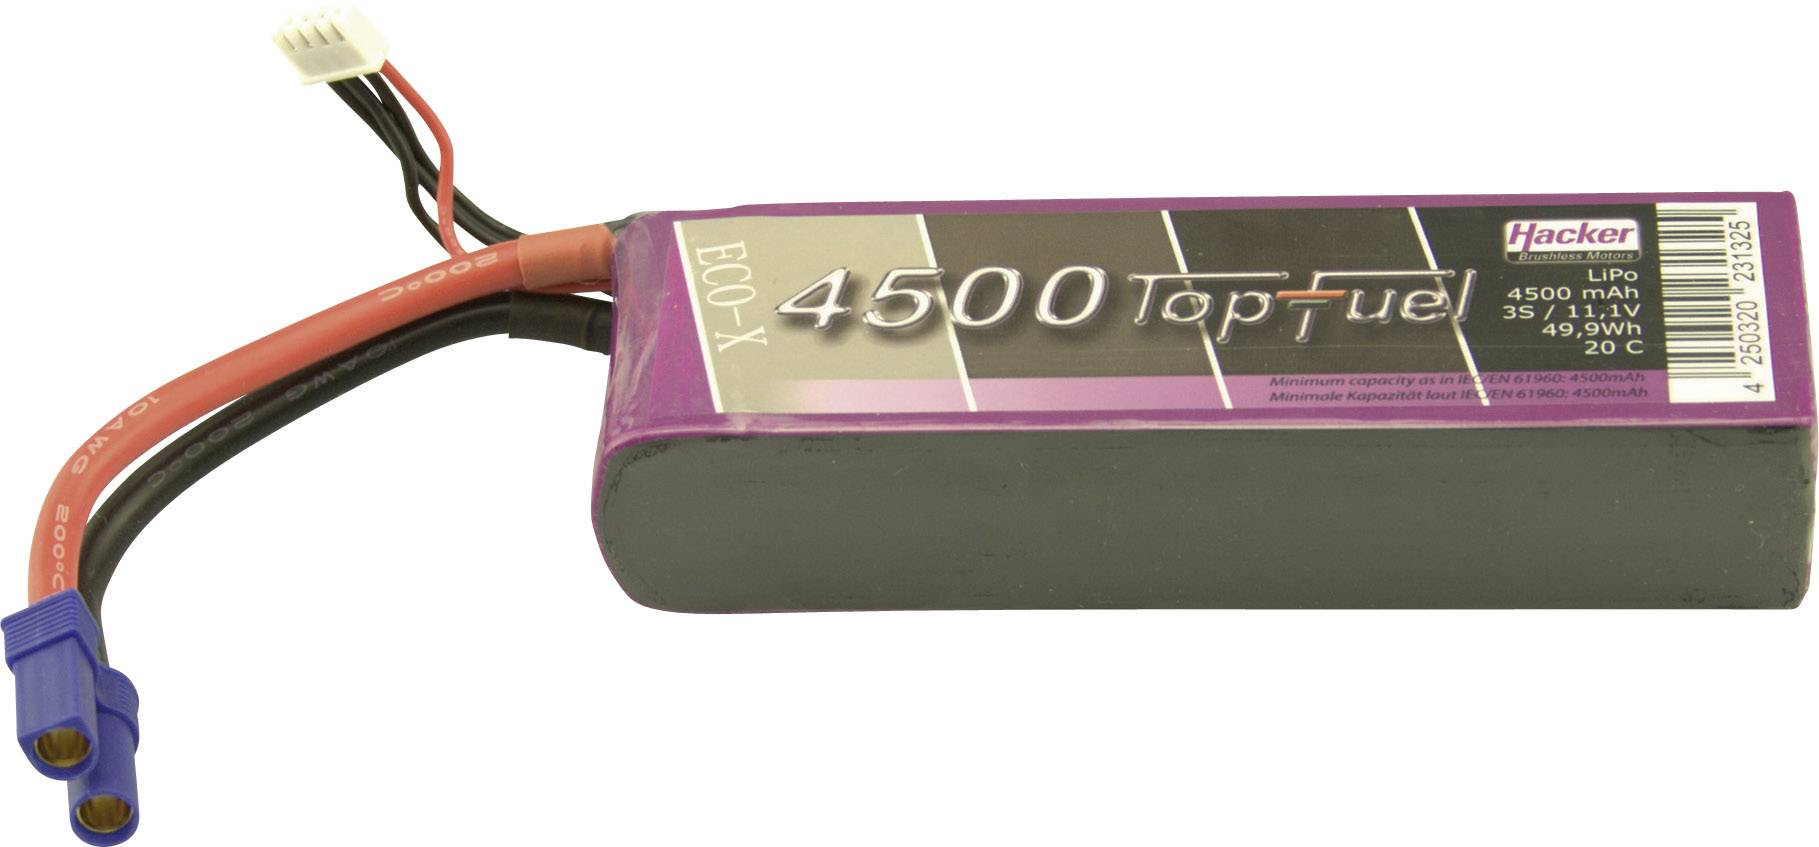 Akupack Li-Pol Hacker 34500331, 11.1 V, 4500 mAh